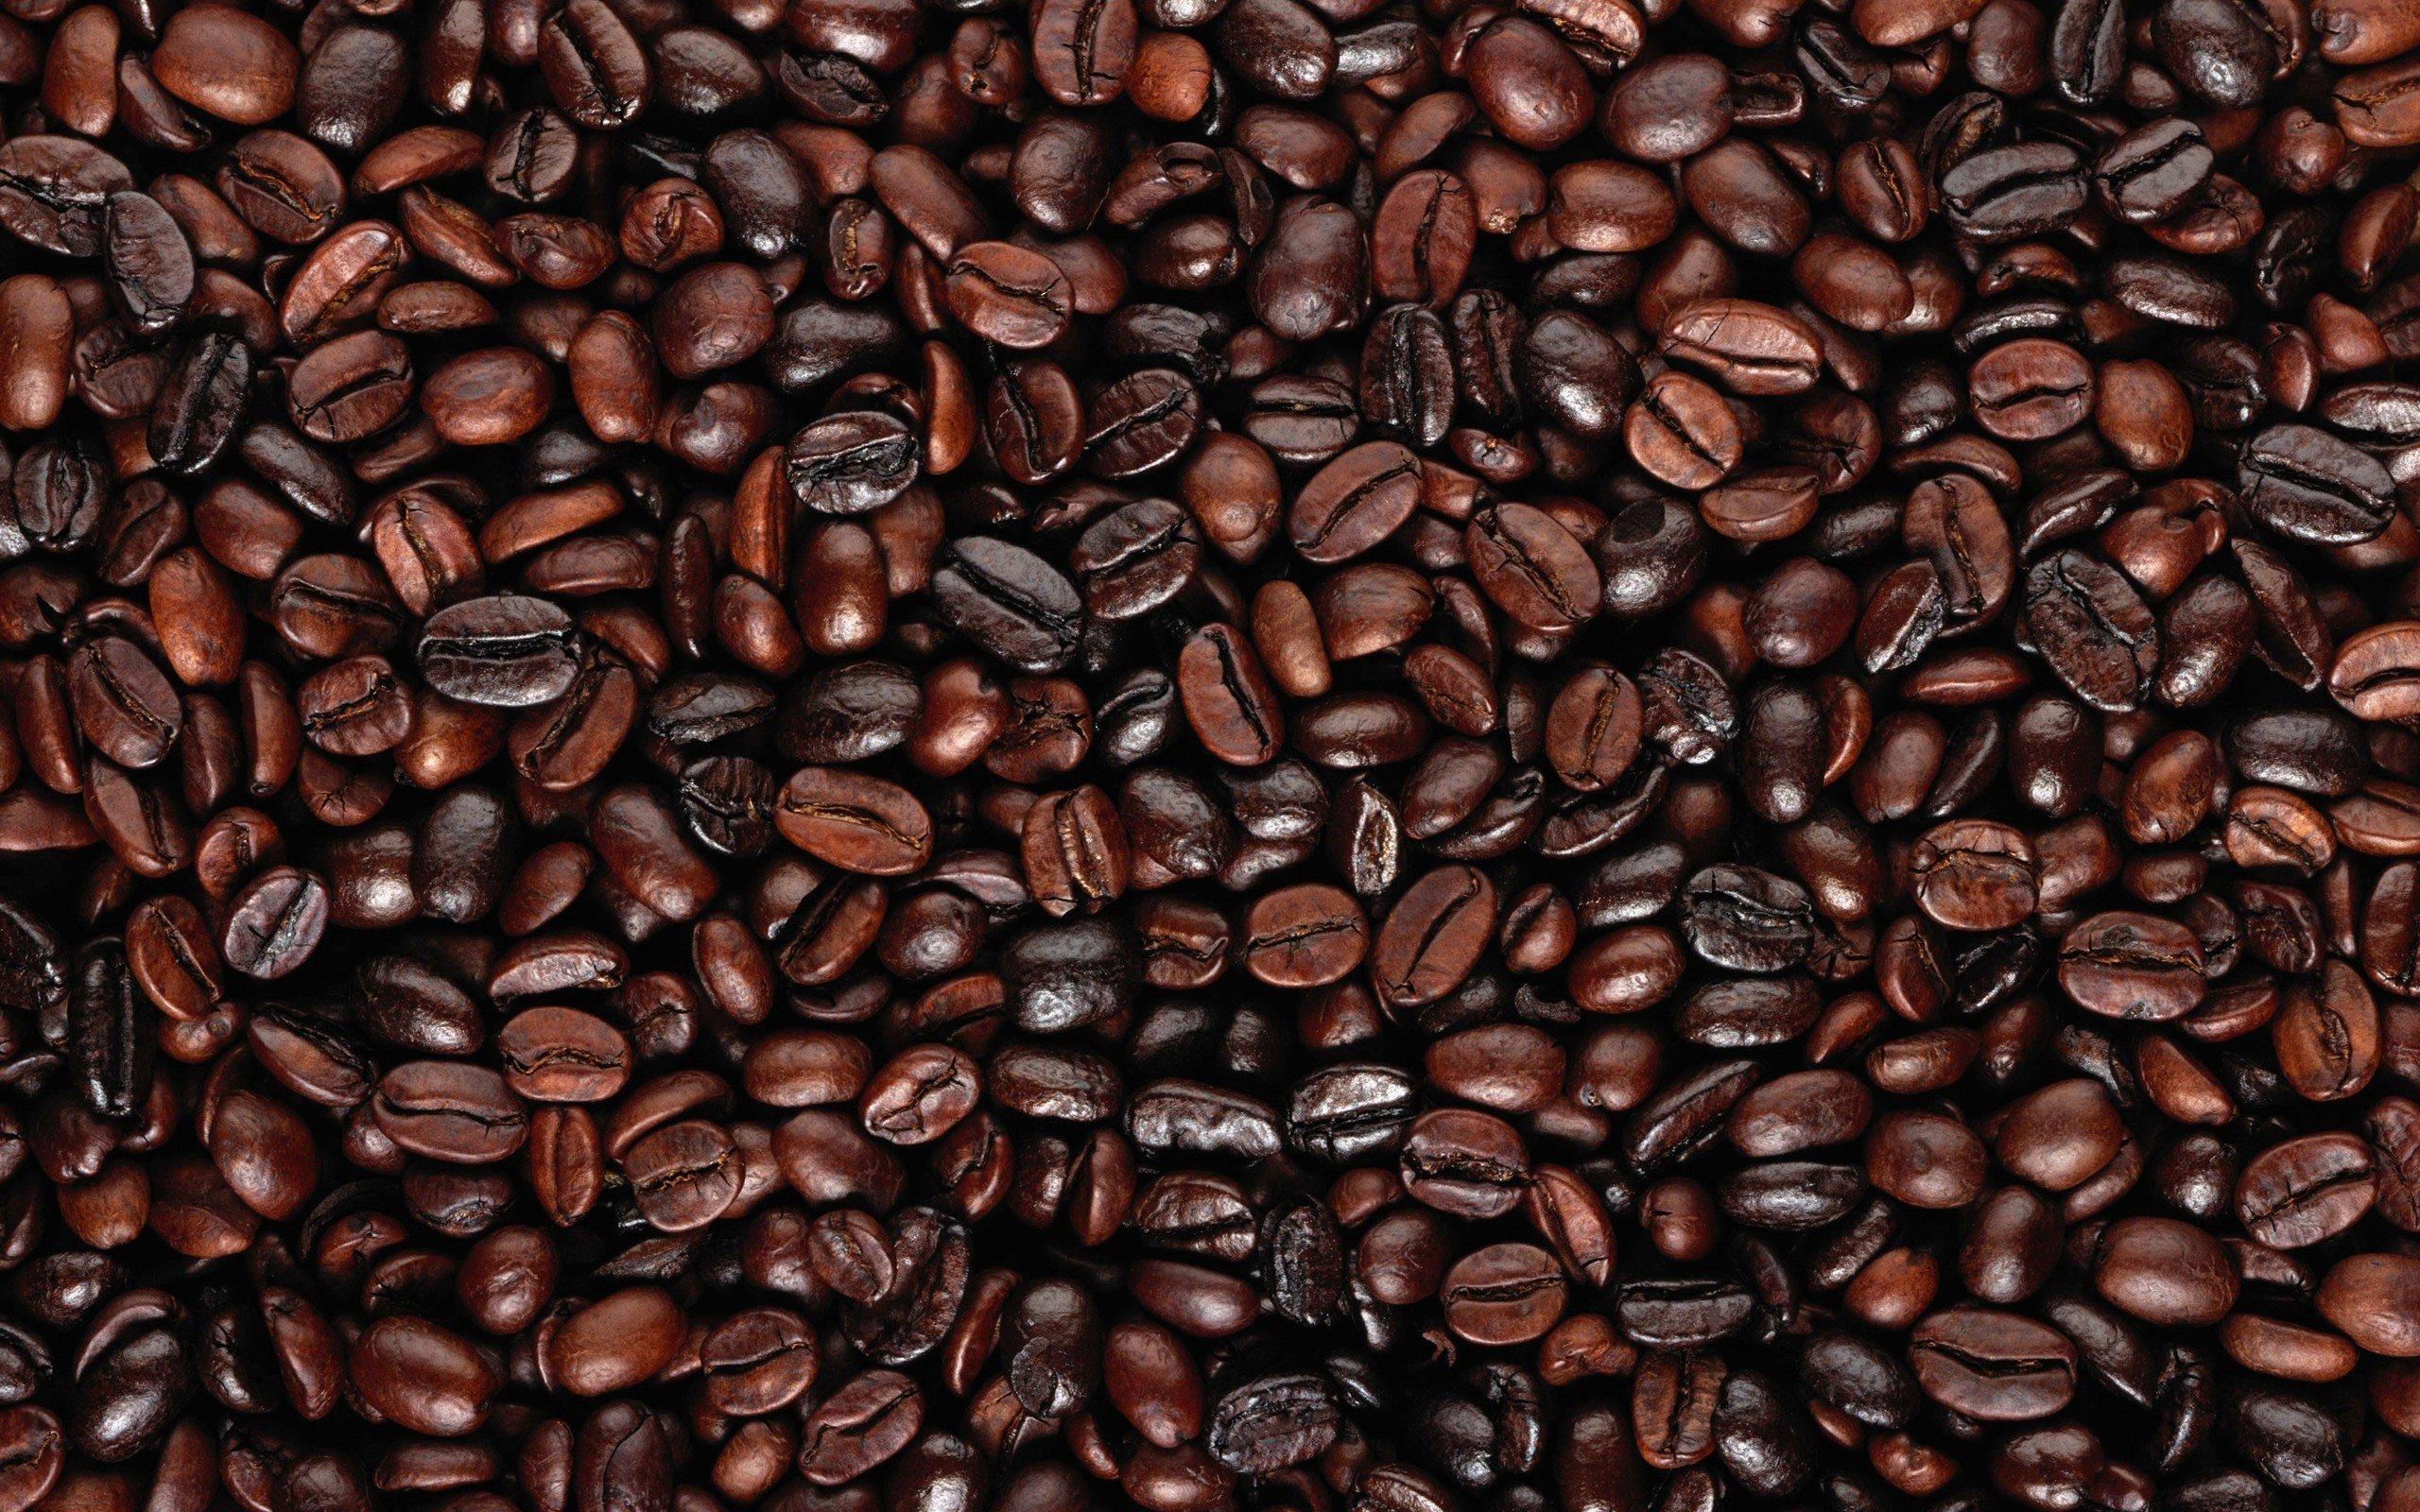 Coffee Beans Desktop Background modren coffee beans desktop background preview wallpaper cup drink